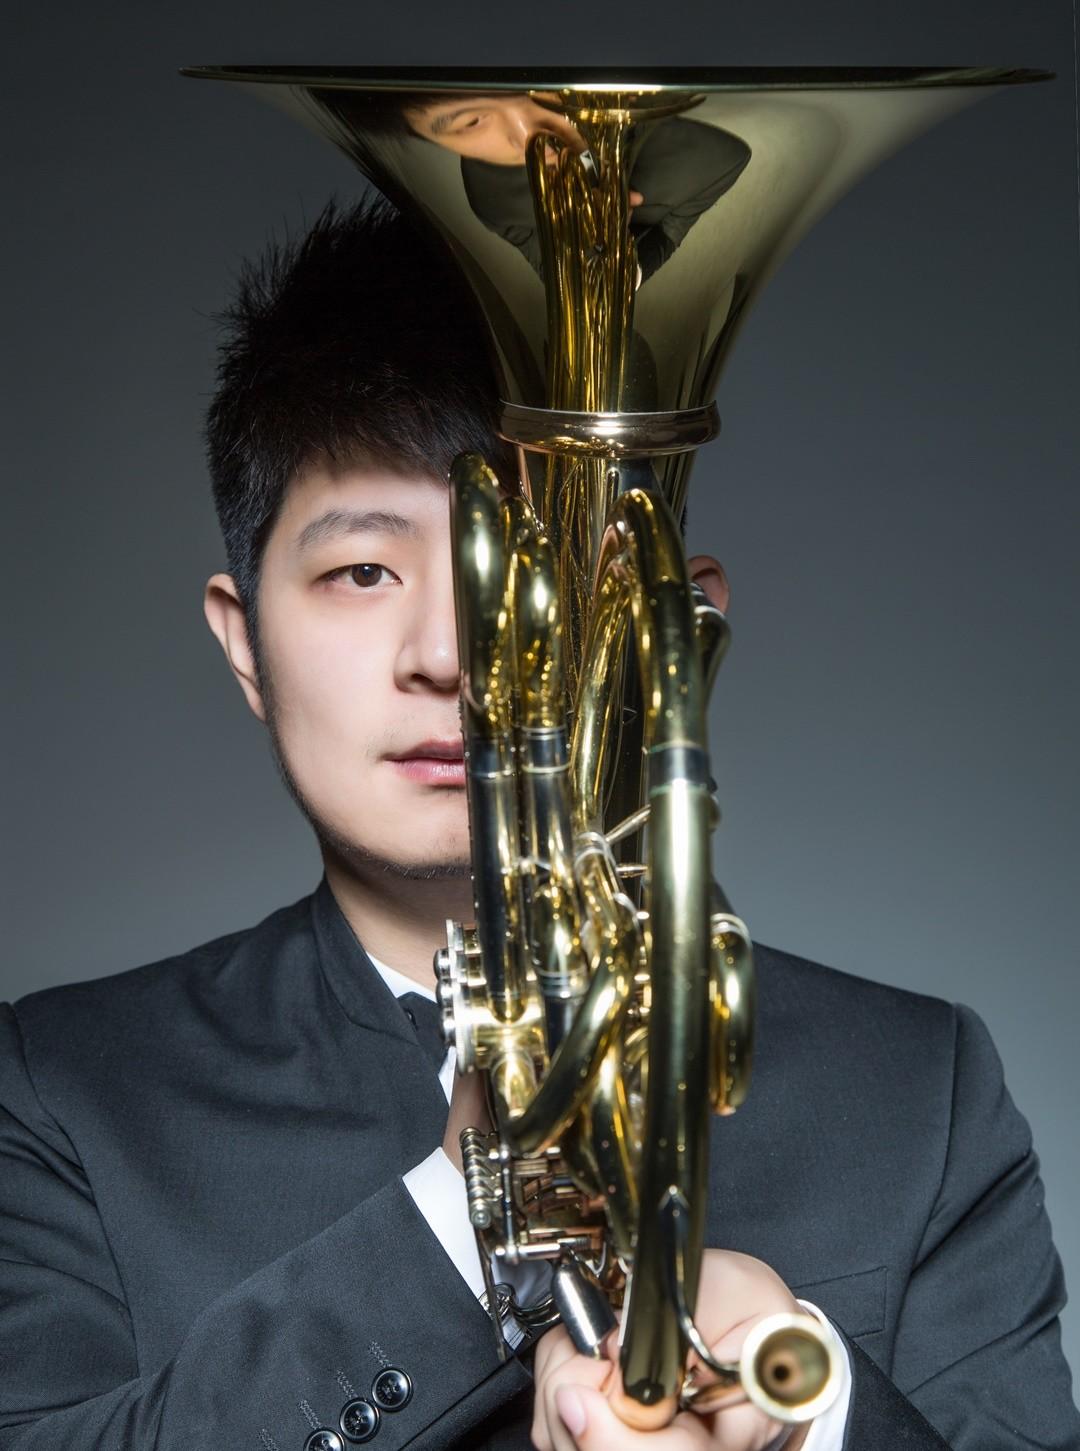 【XSO2019乐季】The Best of Mozart 莫扎特专场音乐会